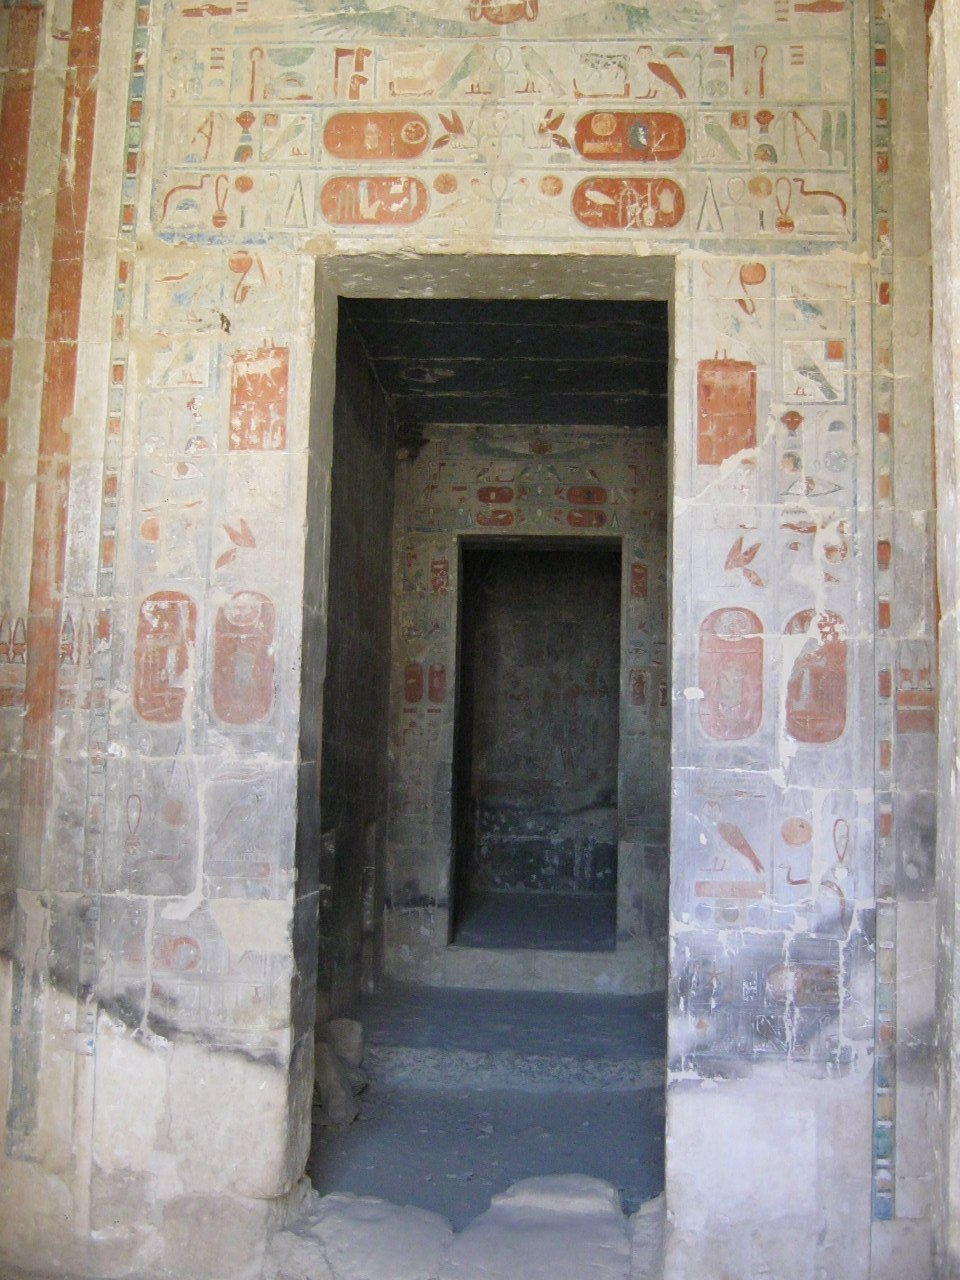 фото из гробниц в долине Царей